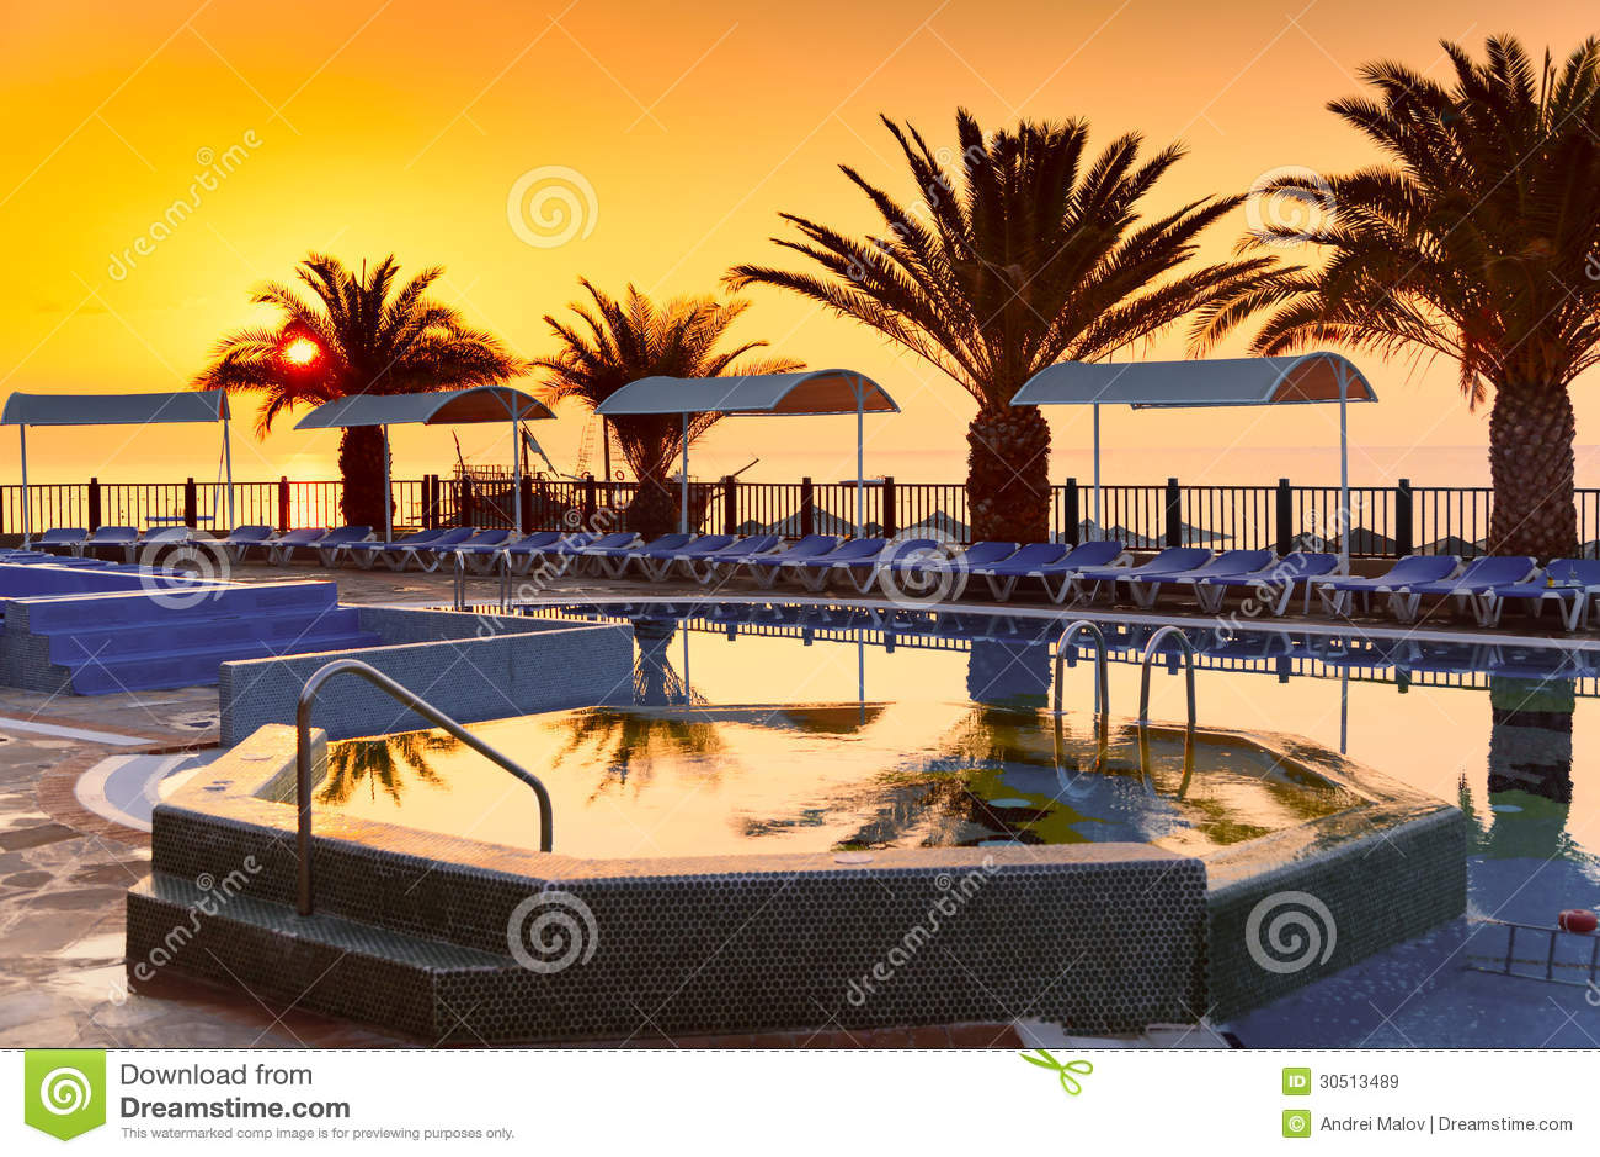 Strandhotelerholungsort mit Pool